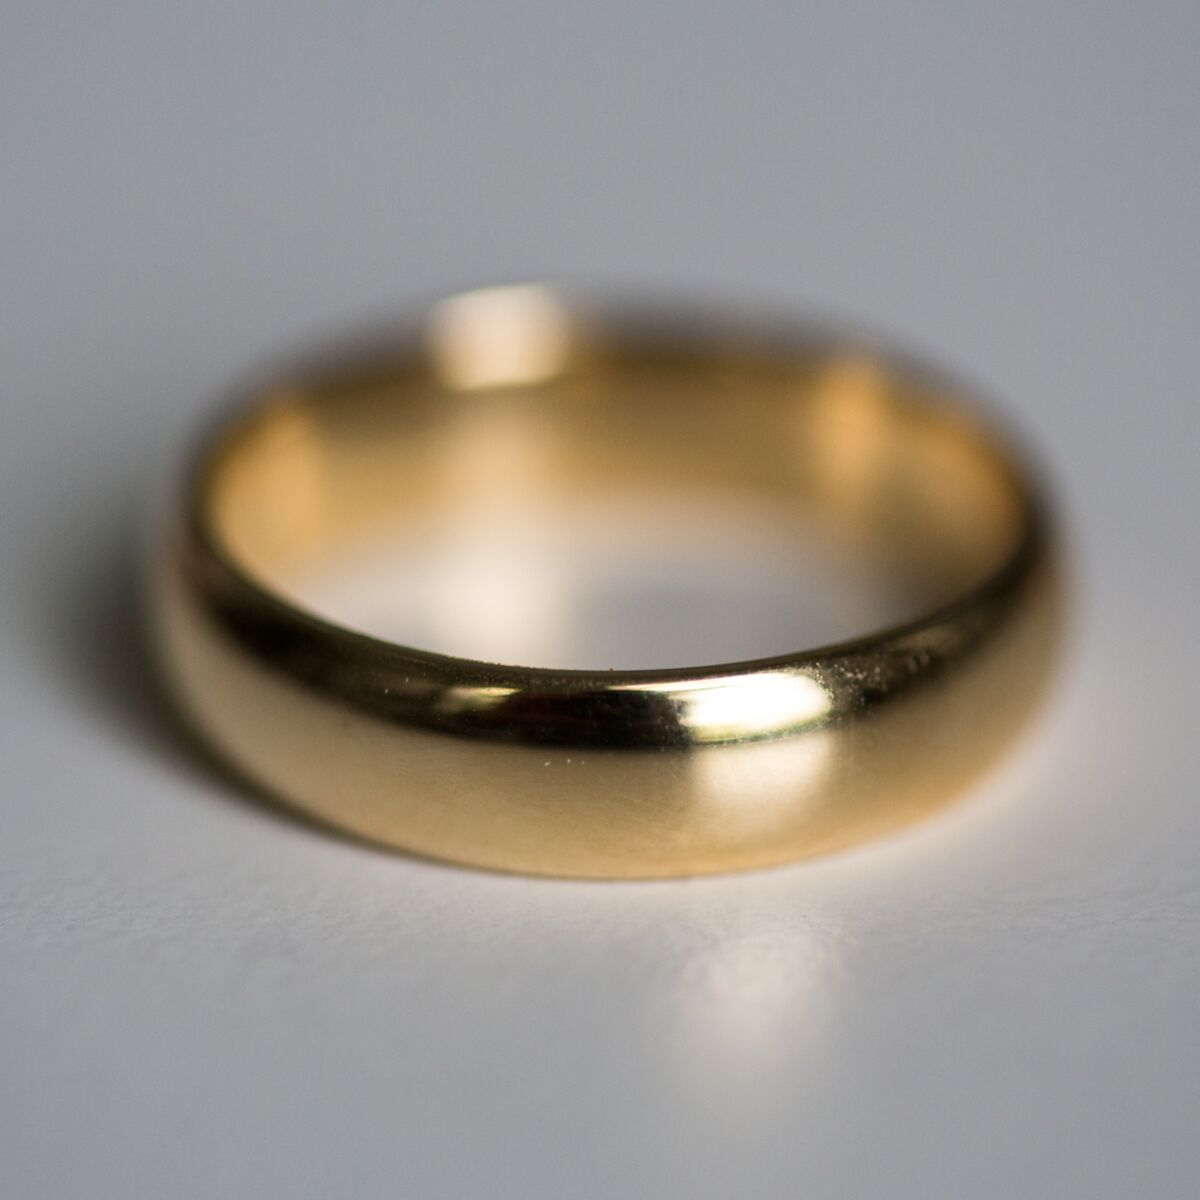 Catbird Classic Wedding Bands, Half Round Band, 6mm image